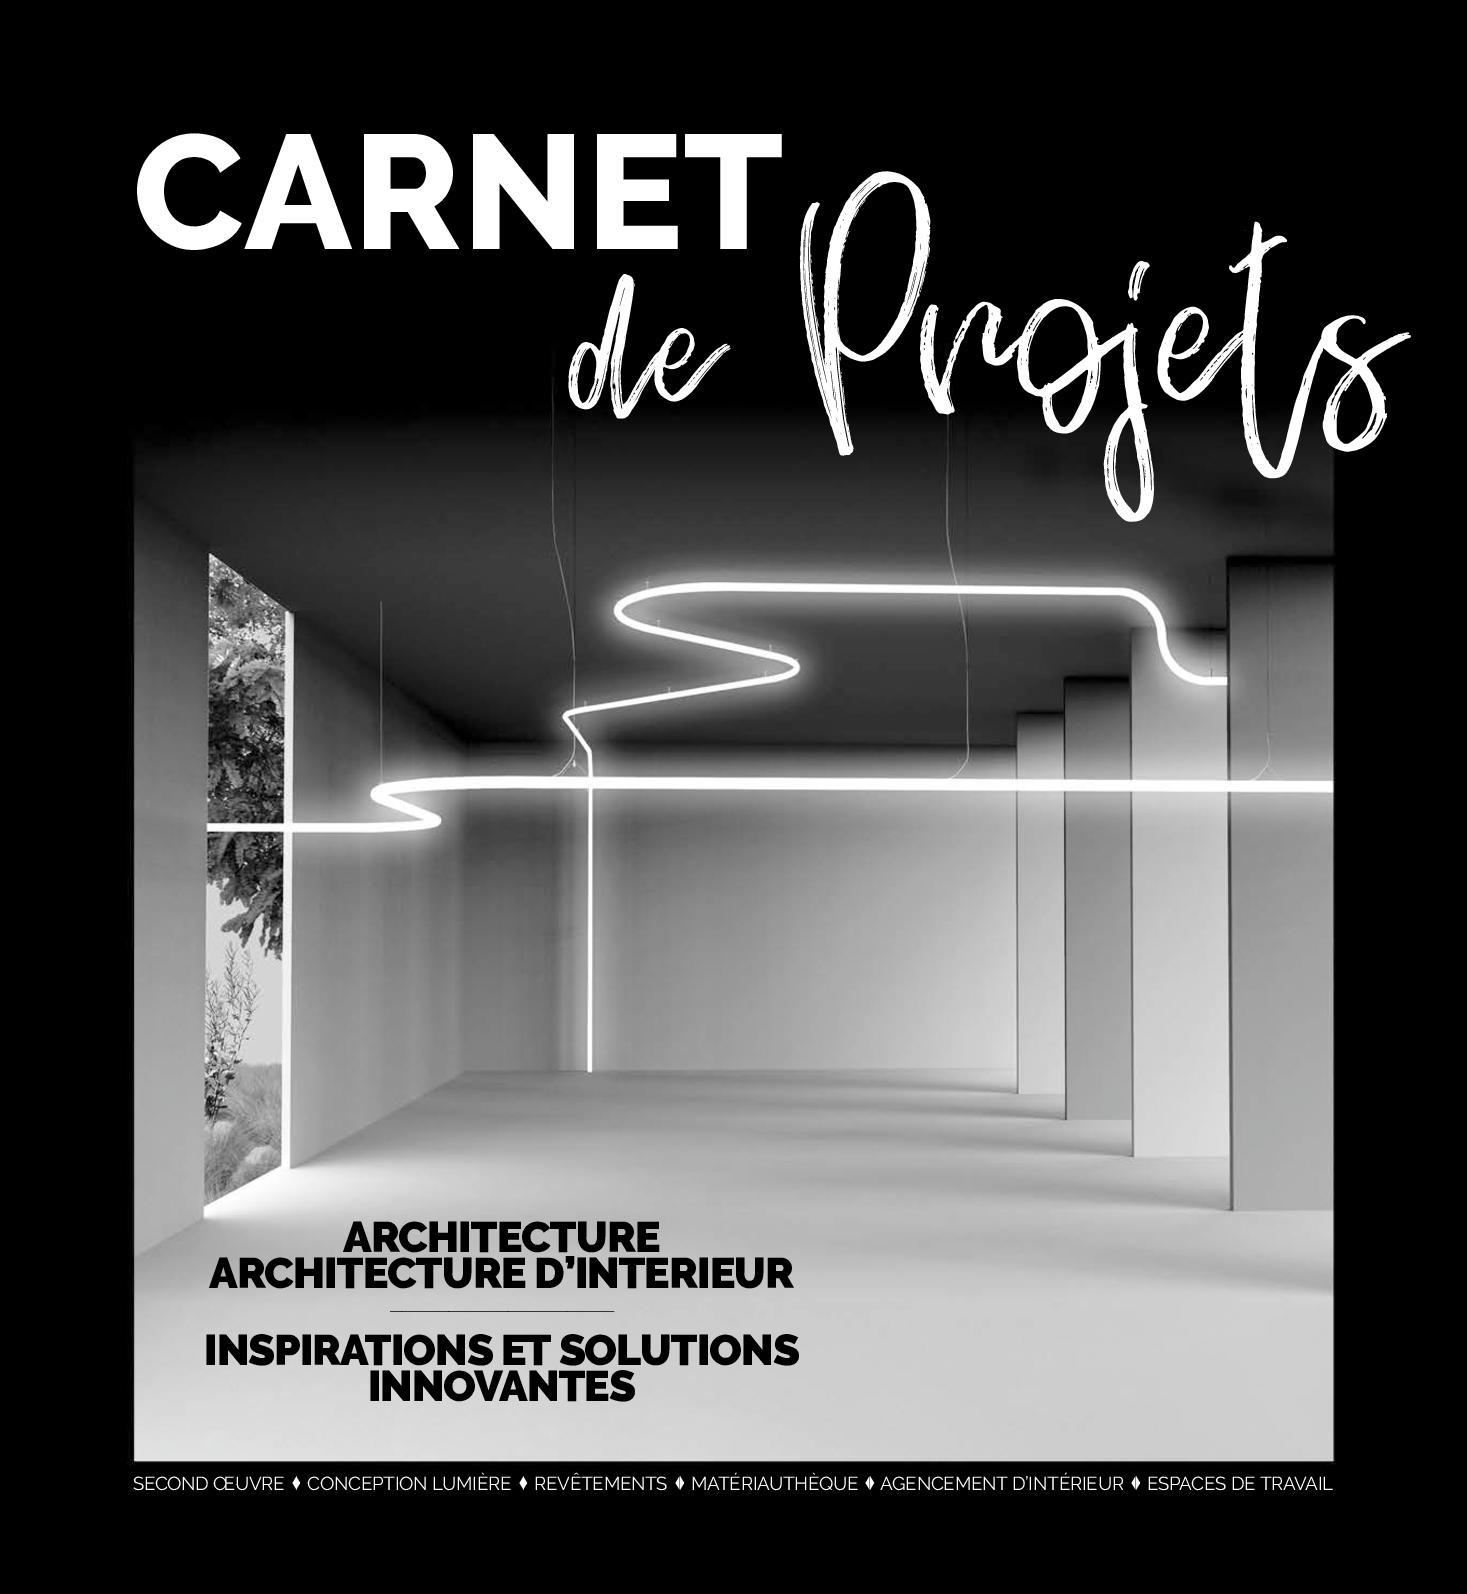 Carnet Projets By Calaméo Domodeco N°4 cA354jLRq